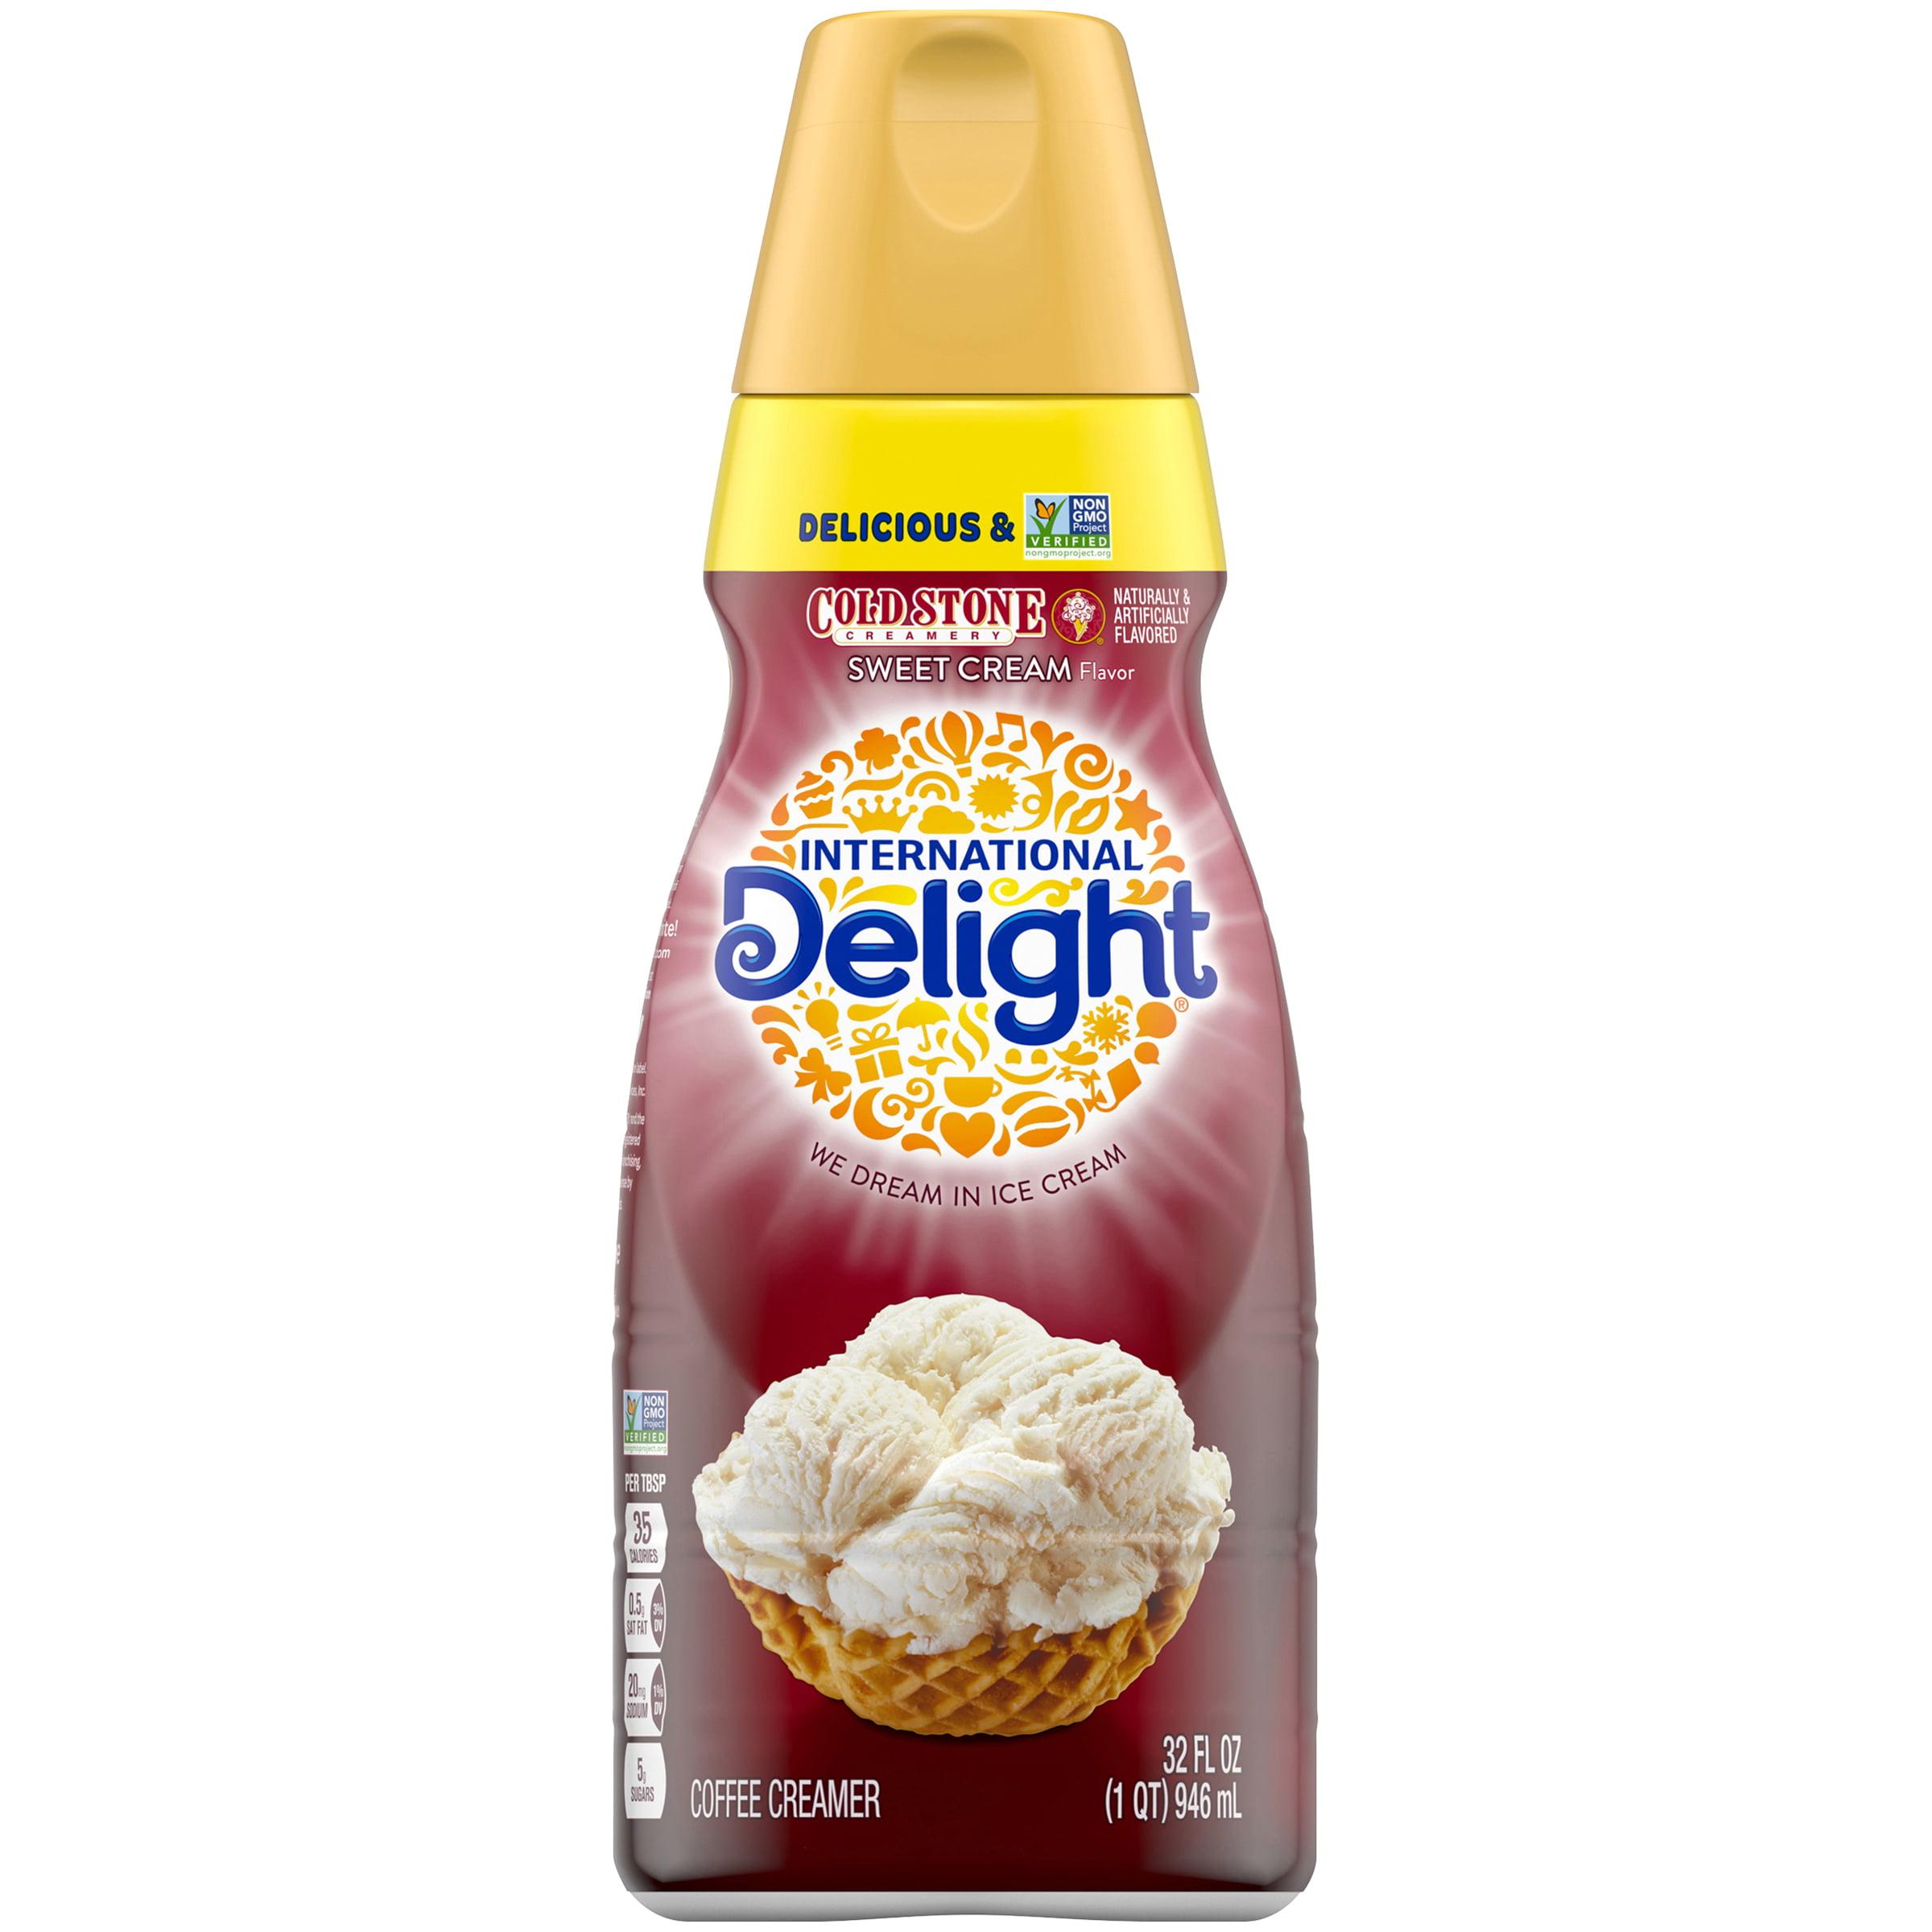 International Delight Cold Stone Creamery Sweet Cream Coffee Creamer 32 Oz Walmart Com Walmart Com